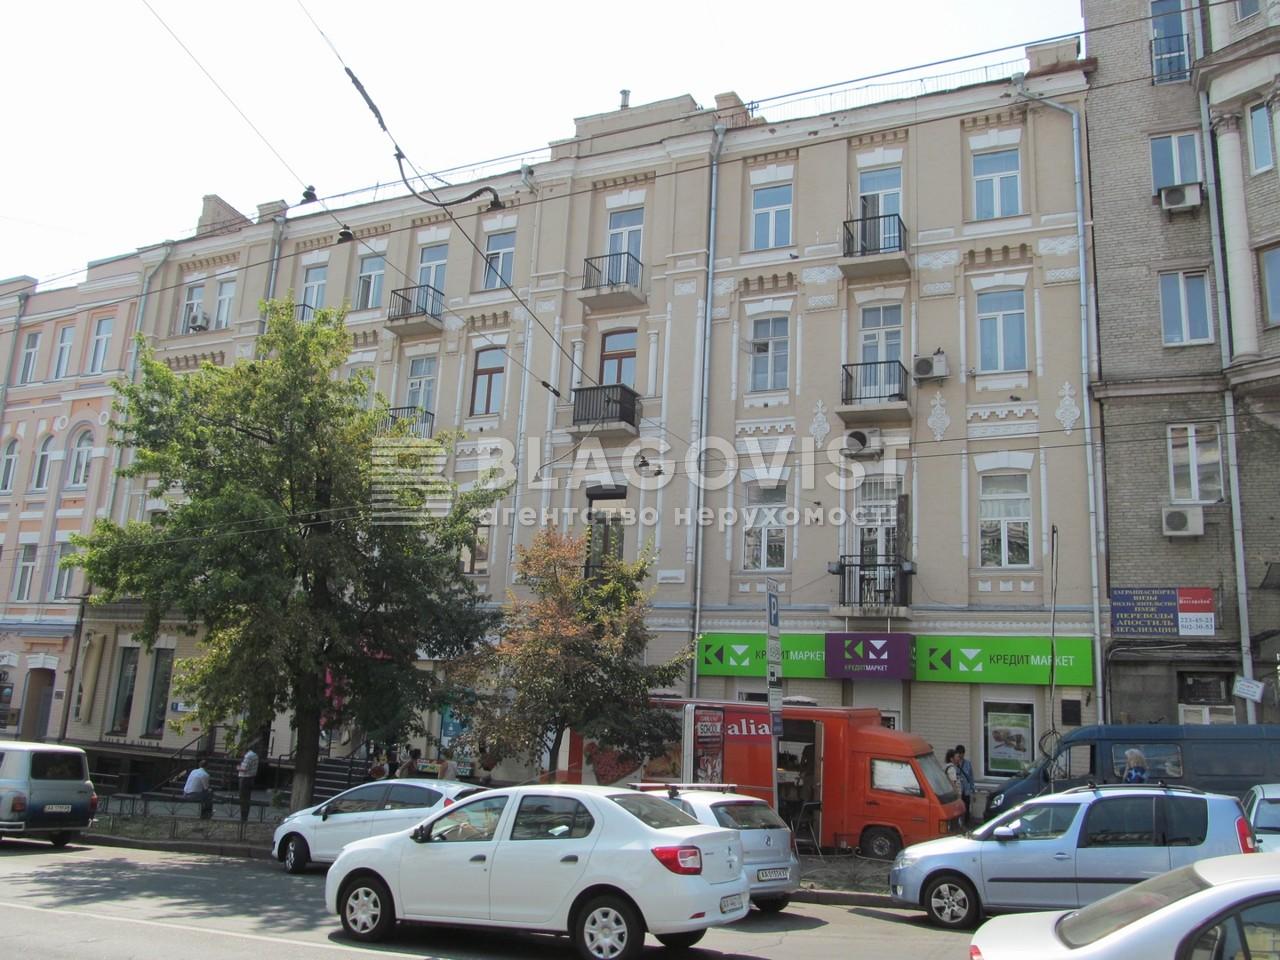 Квартира H-3305, Толстого Льва, 5, Киев - Фото 2